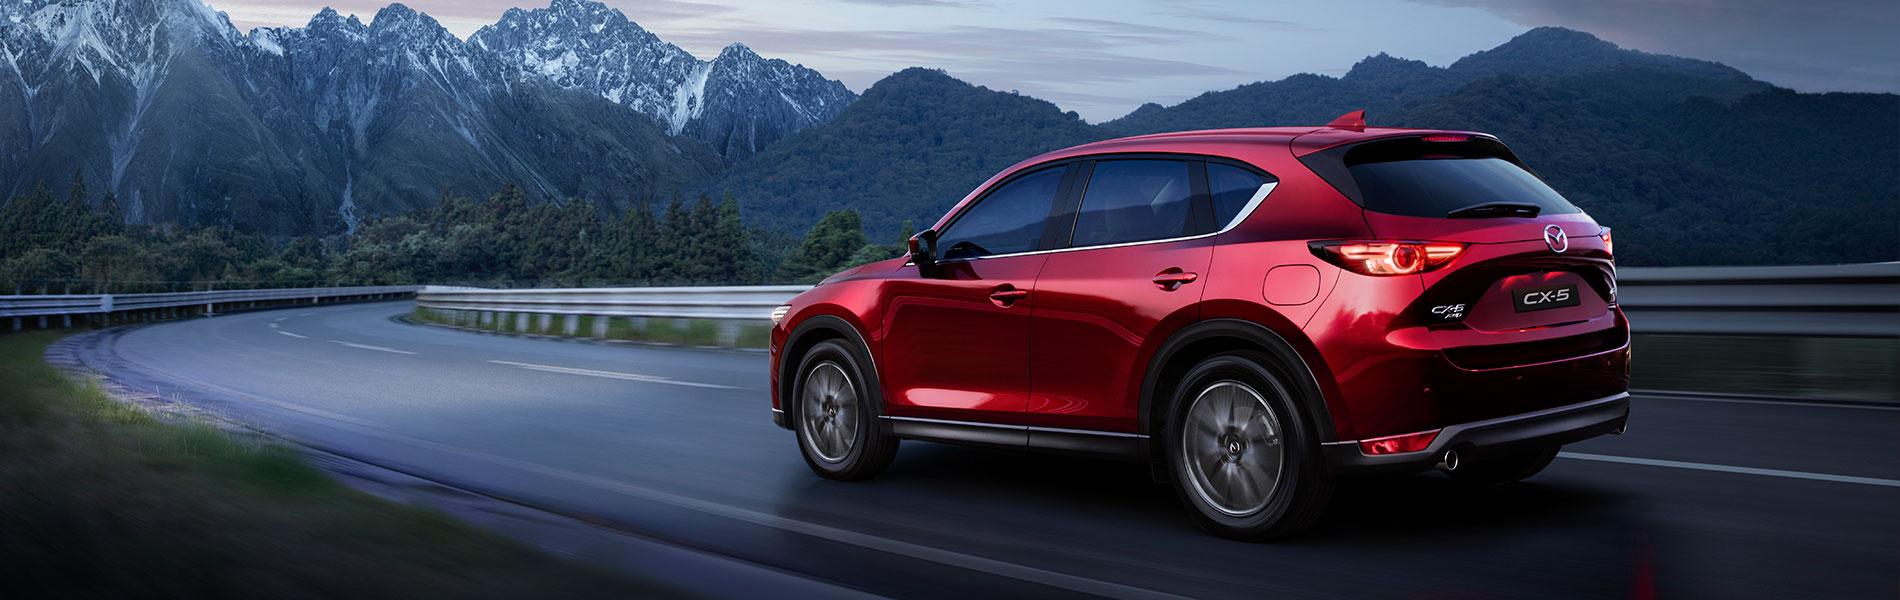 Mazda Next-Gen CX-5 Image 2